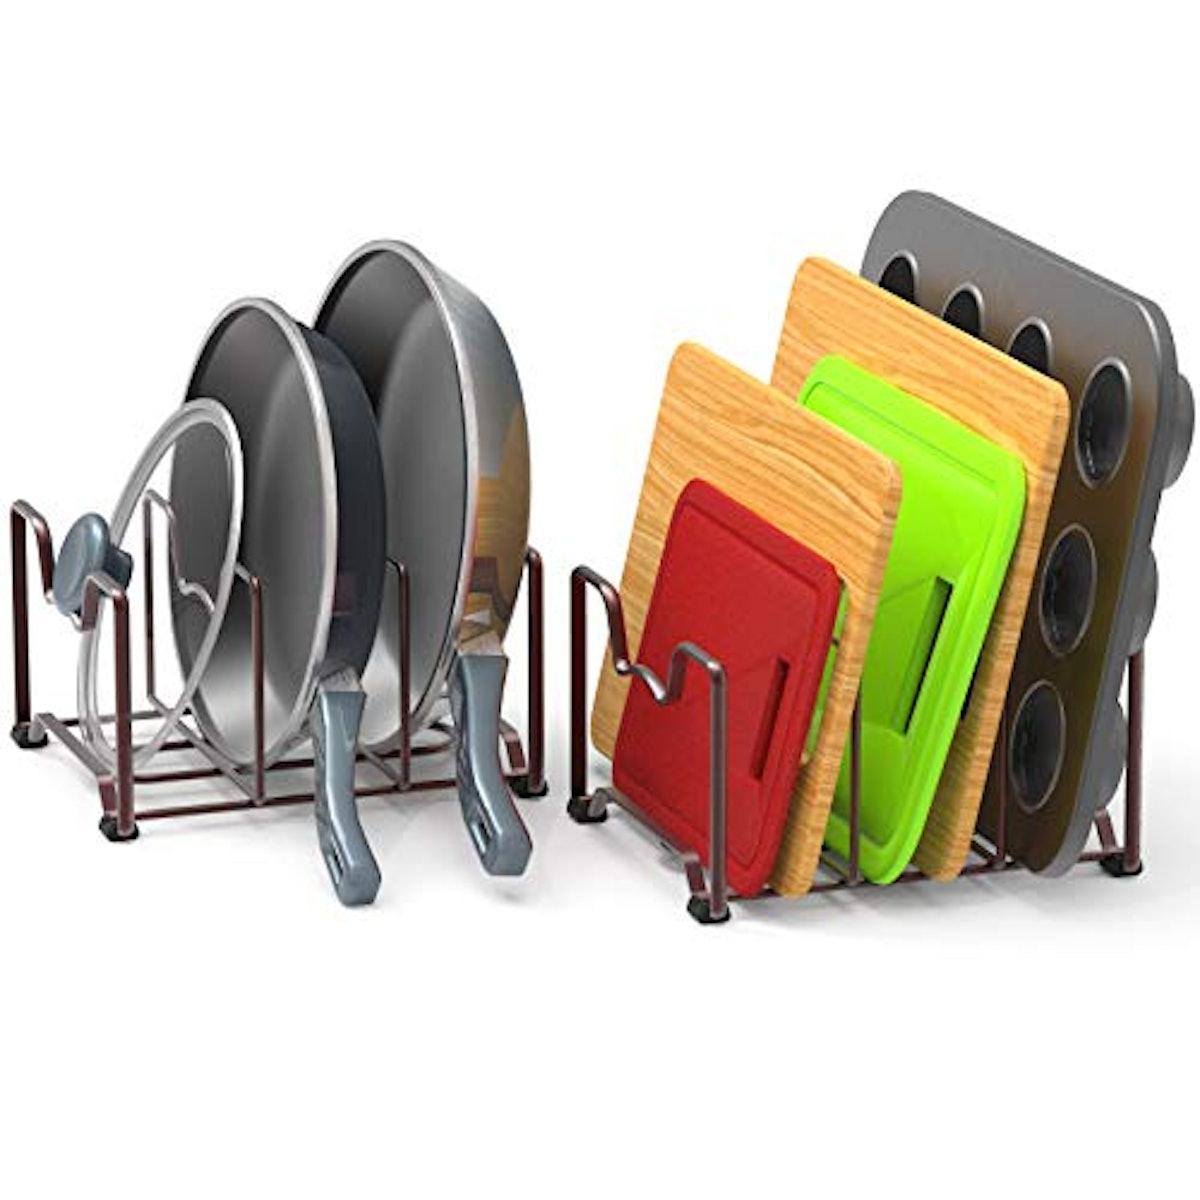 SimpleHouseware Kitchen Cabinet Pantry and Bakeware Organizer